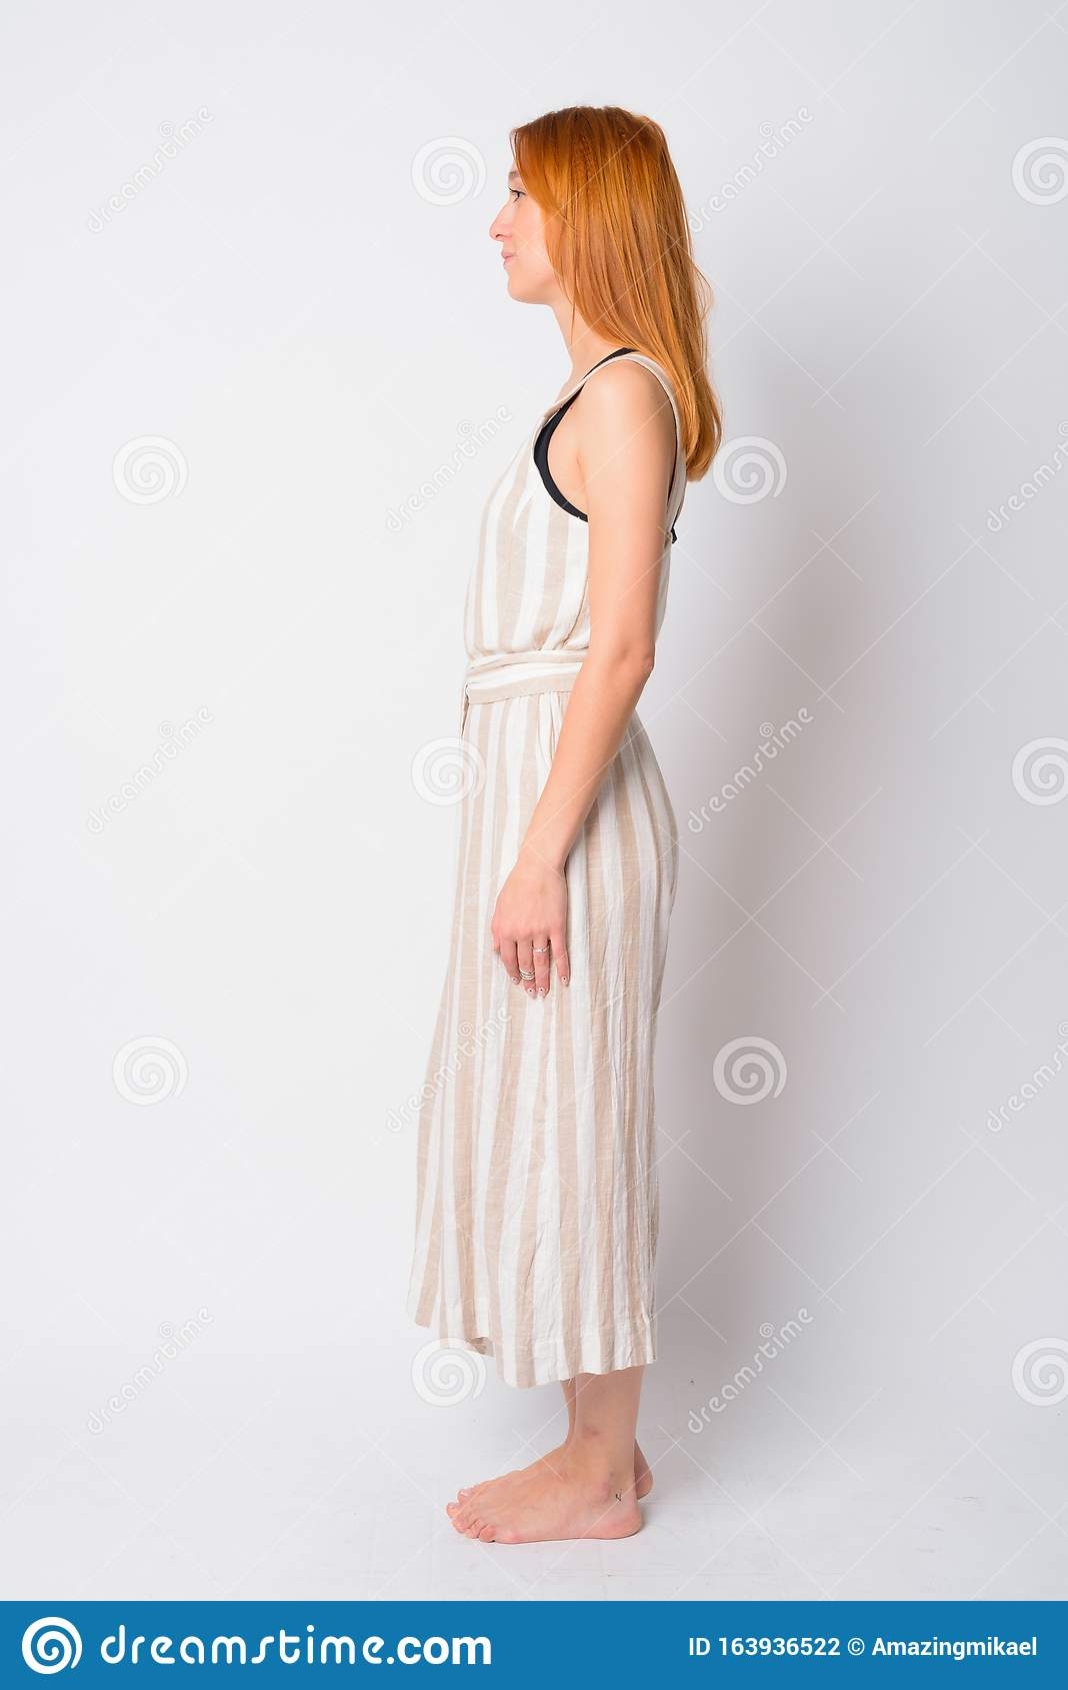 Full Body Shot Profile View Of Young Beautiful Redhead